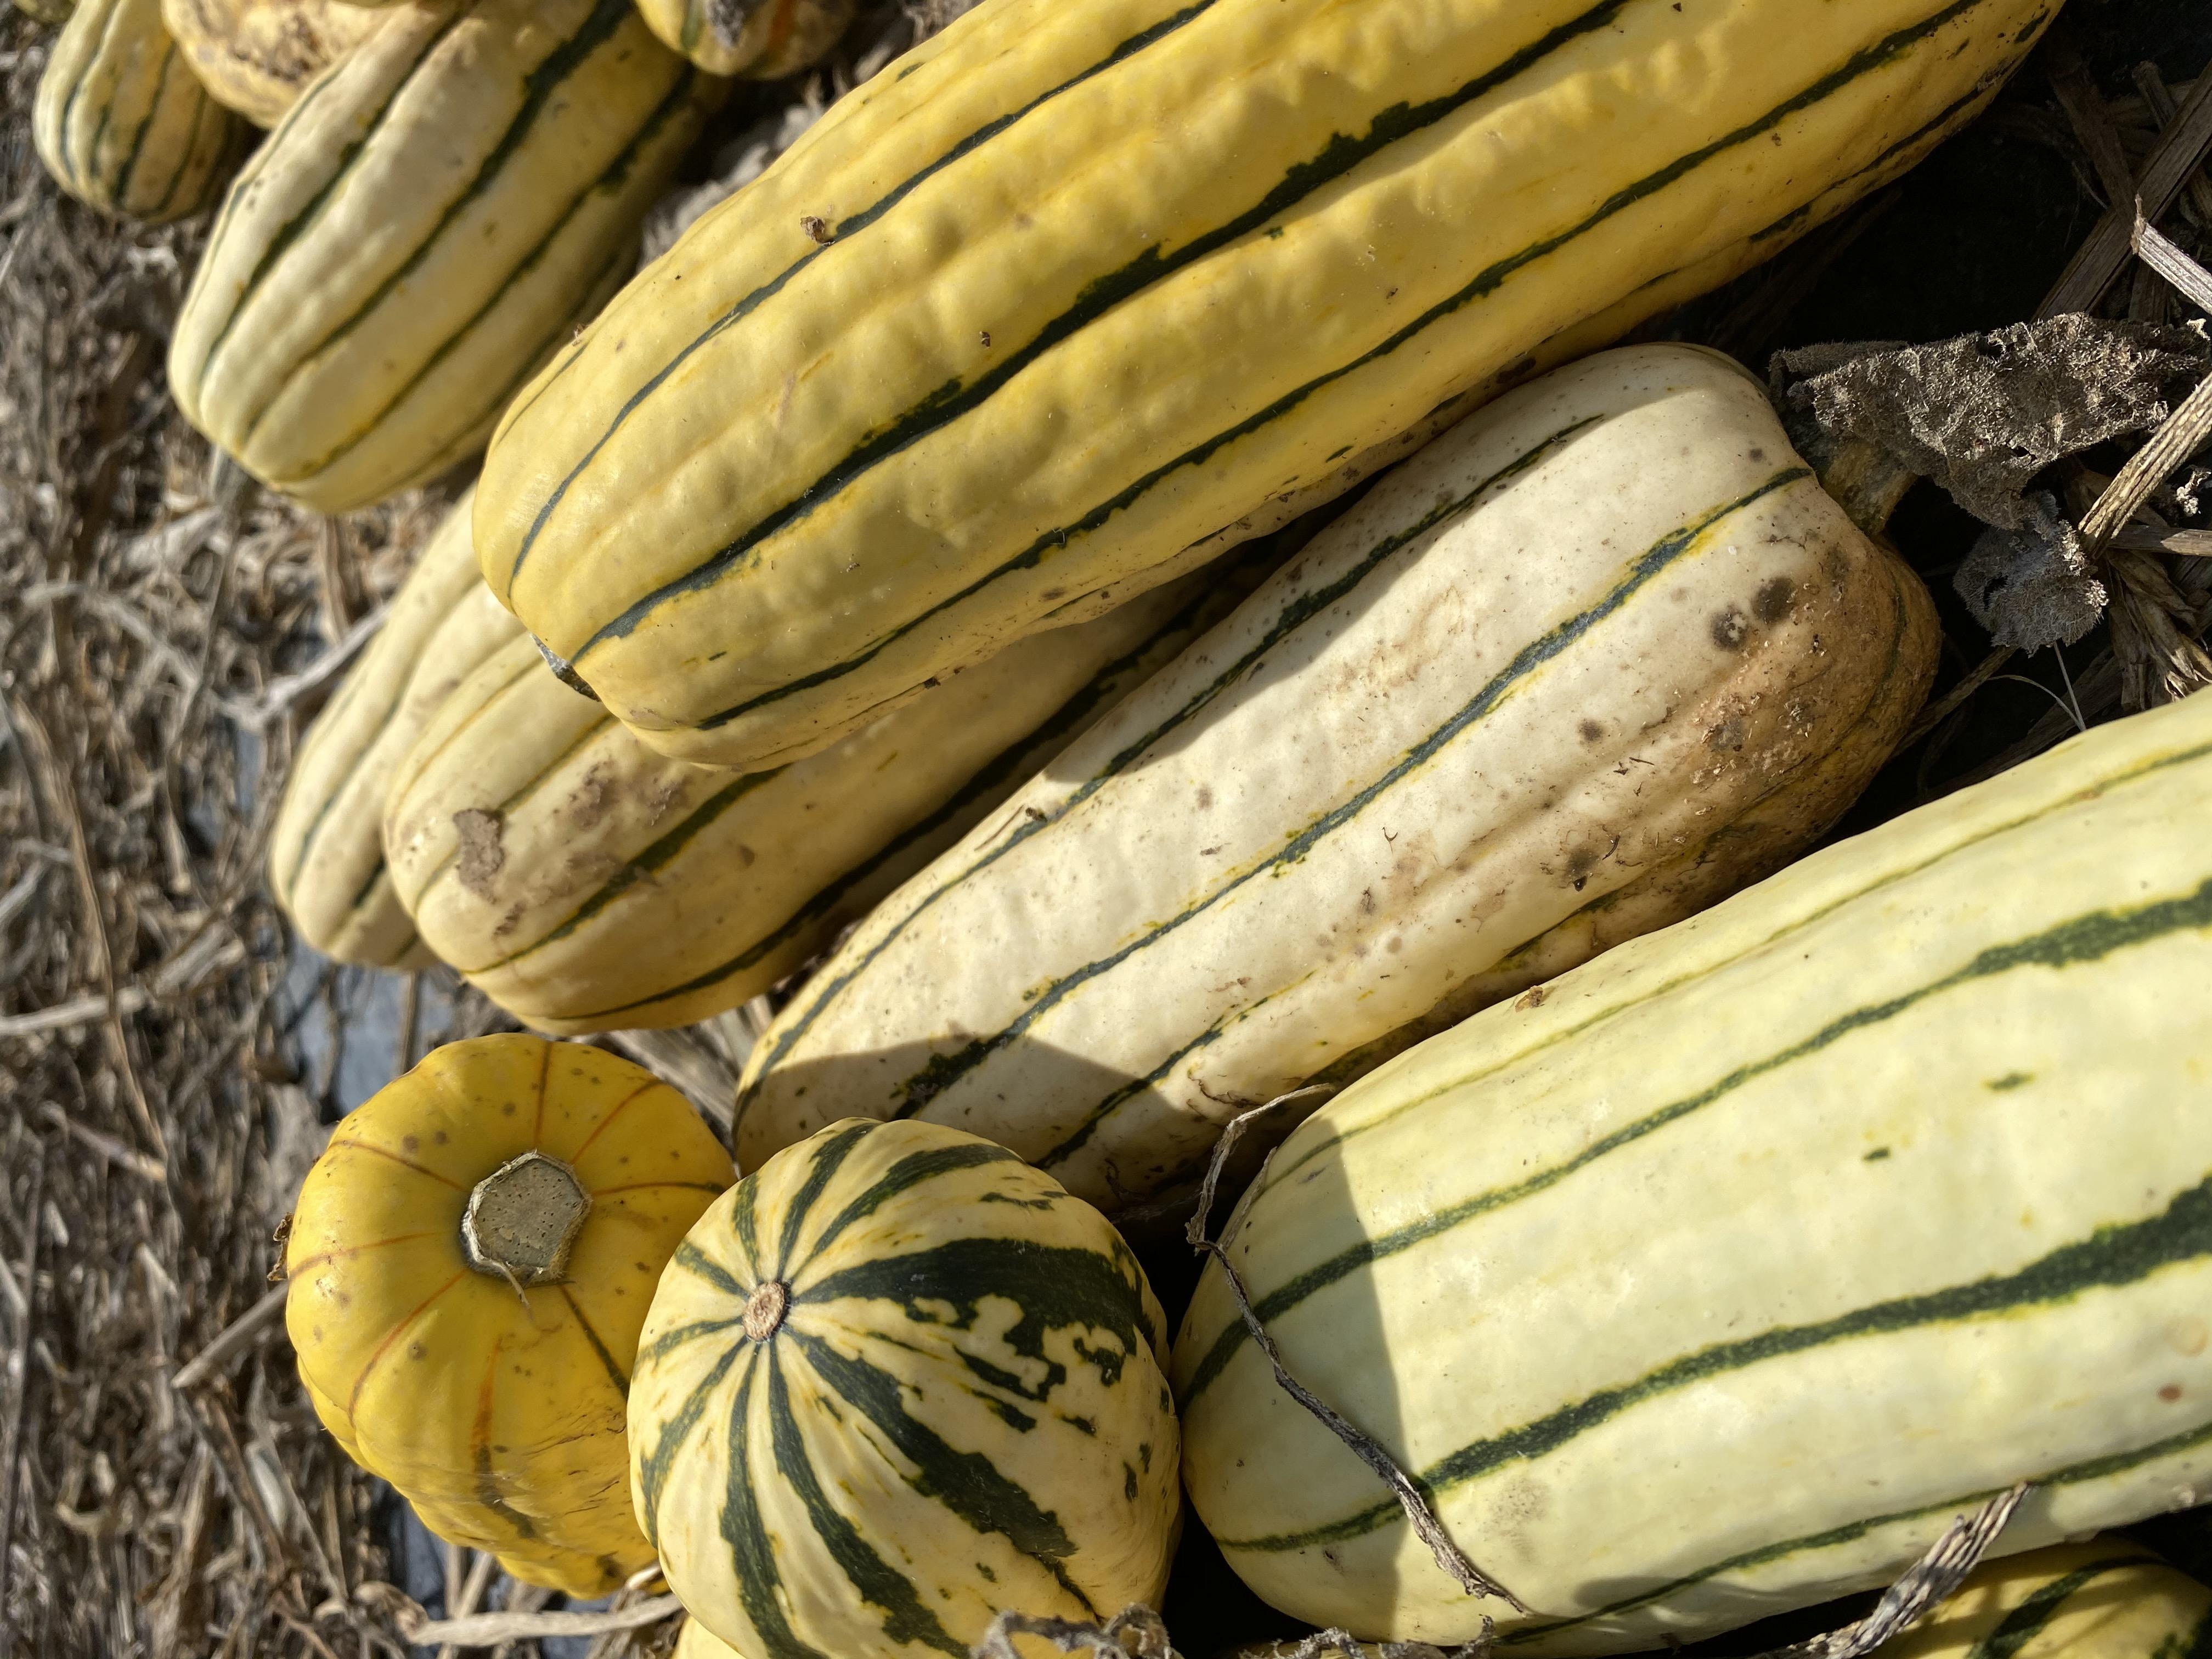 Farm Happenings for Week of September 14, 2020